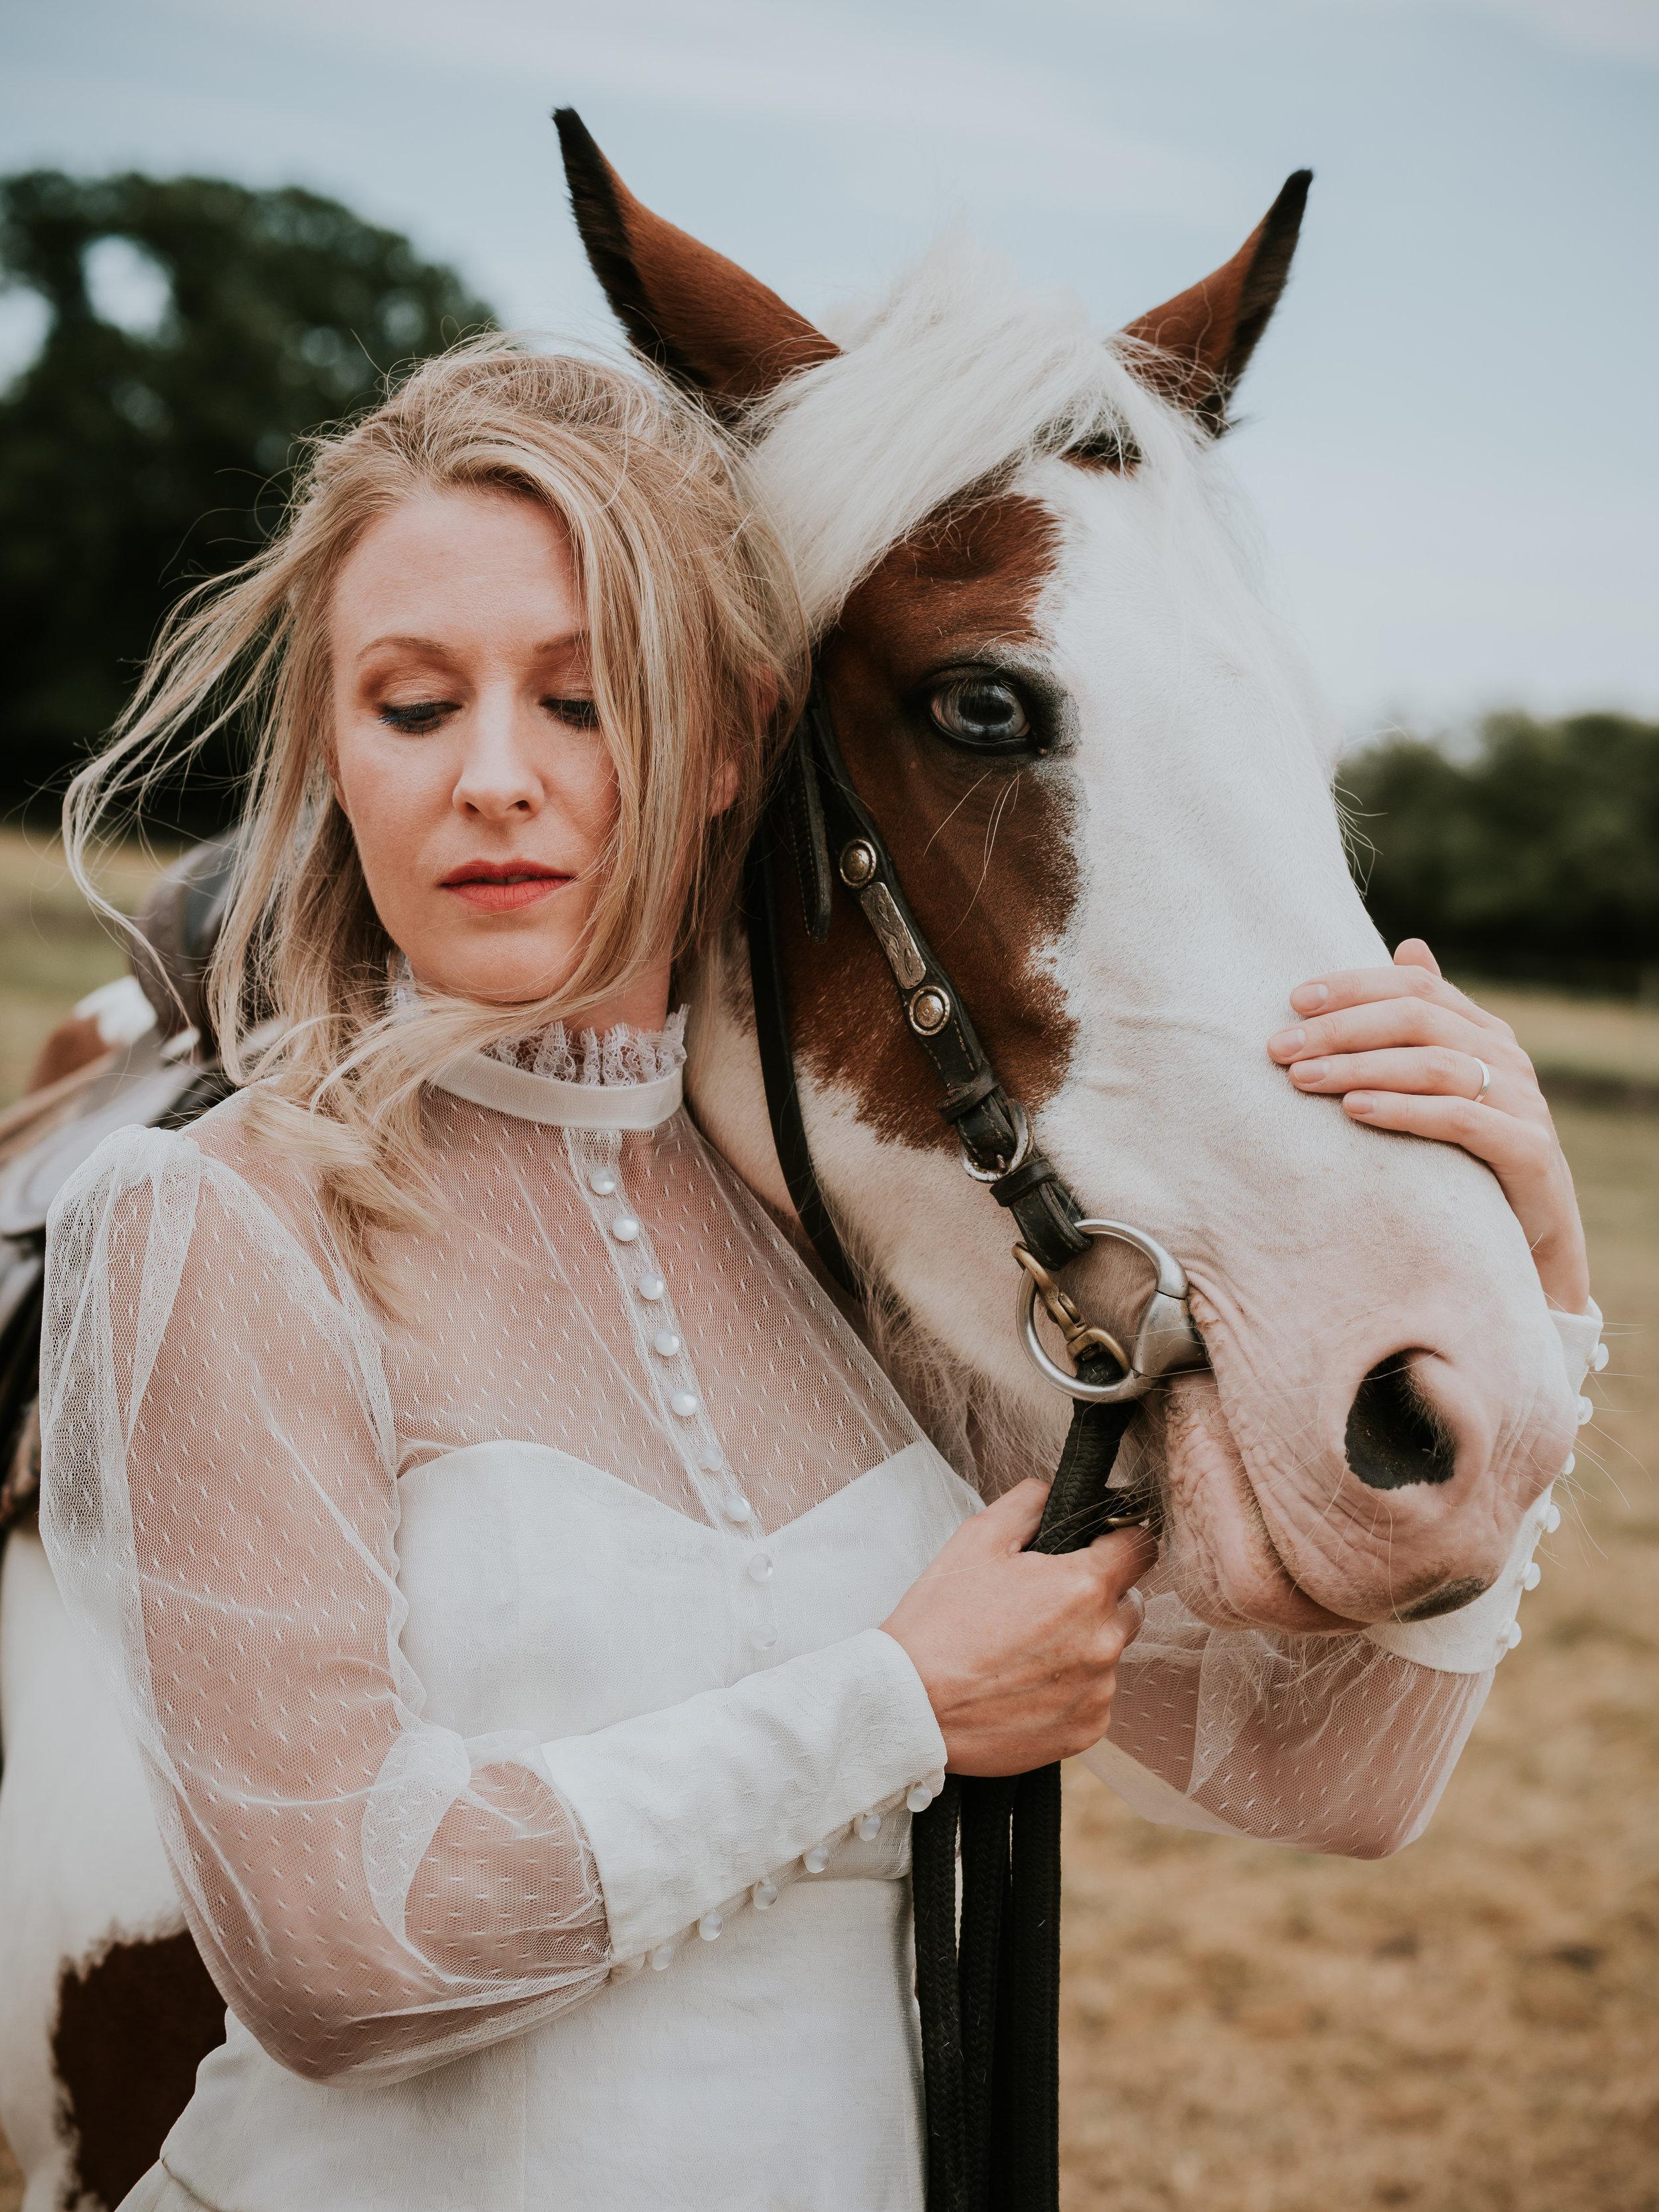 Jessica-Milberg-Photography-Brighton-London-Wedding-Fashion-Photographer-Creative-Wedding-Dress-15.jpg